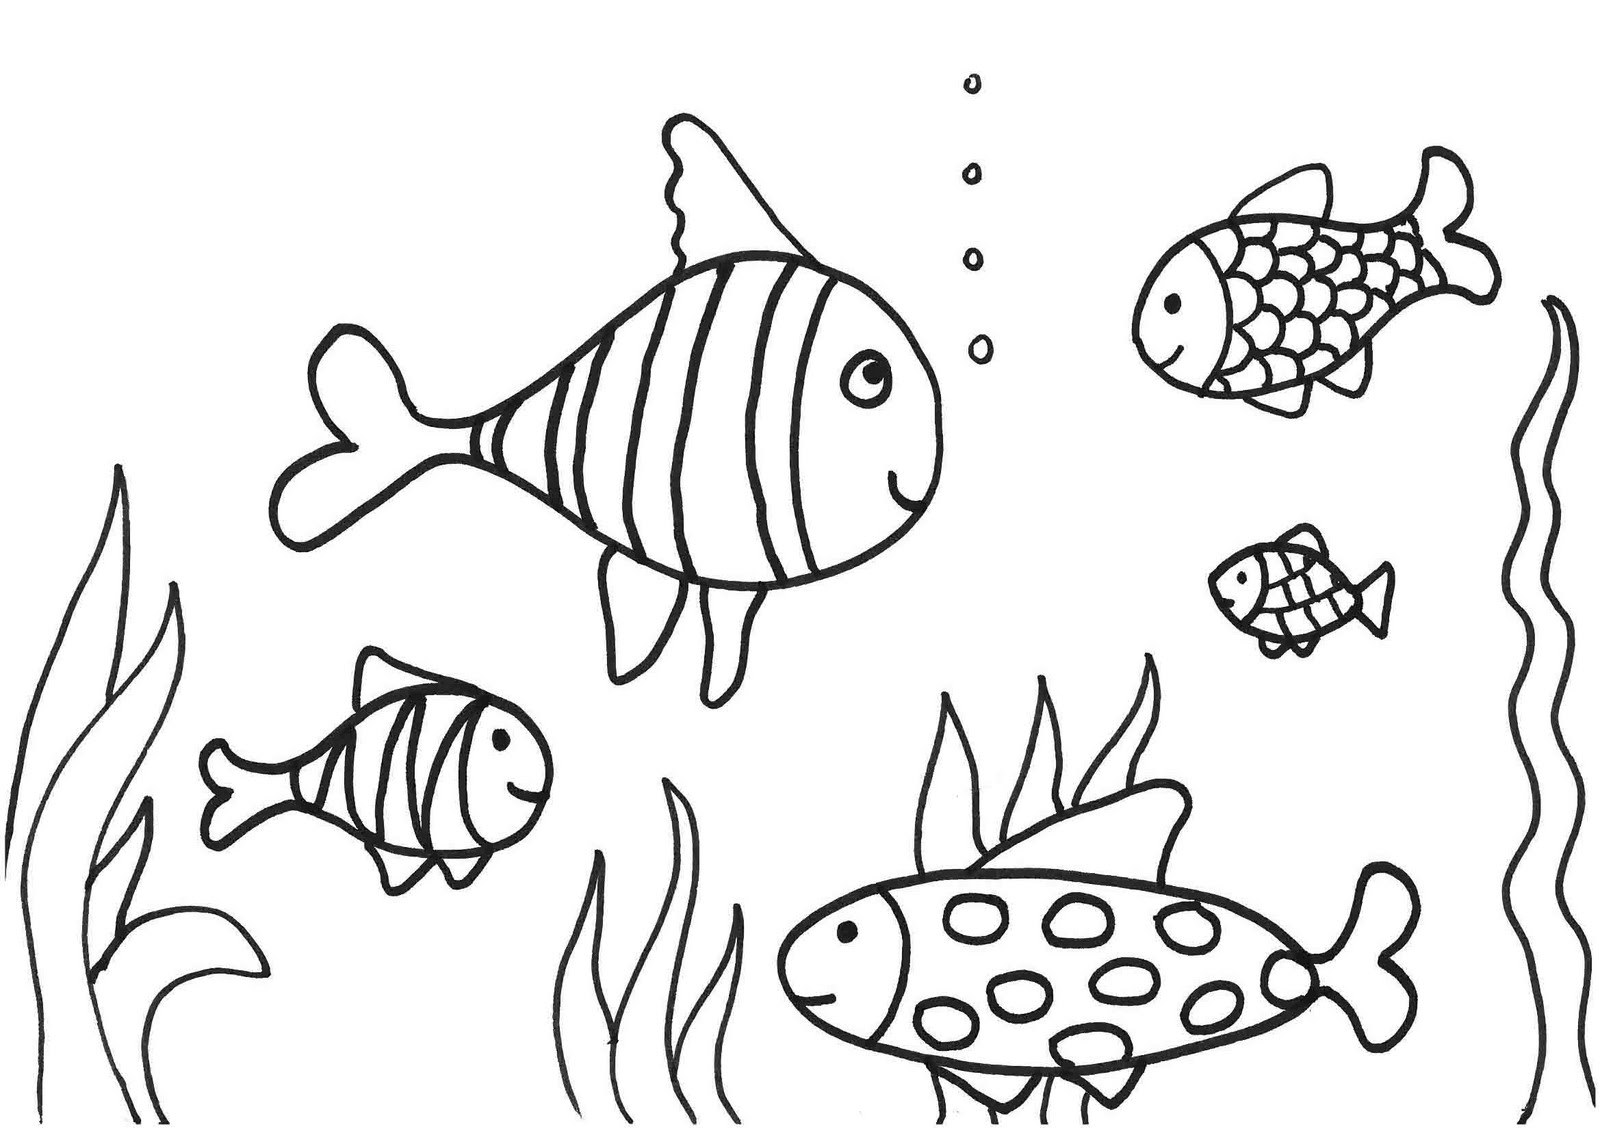 Sea Fish Drawing at GetDrawings.com | Free for personal use Sea Fish ...